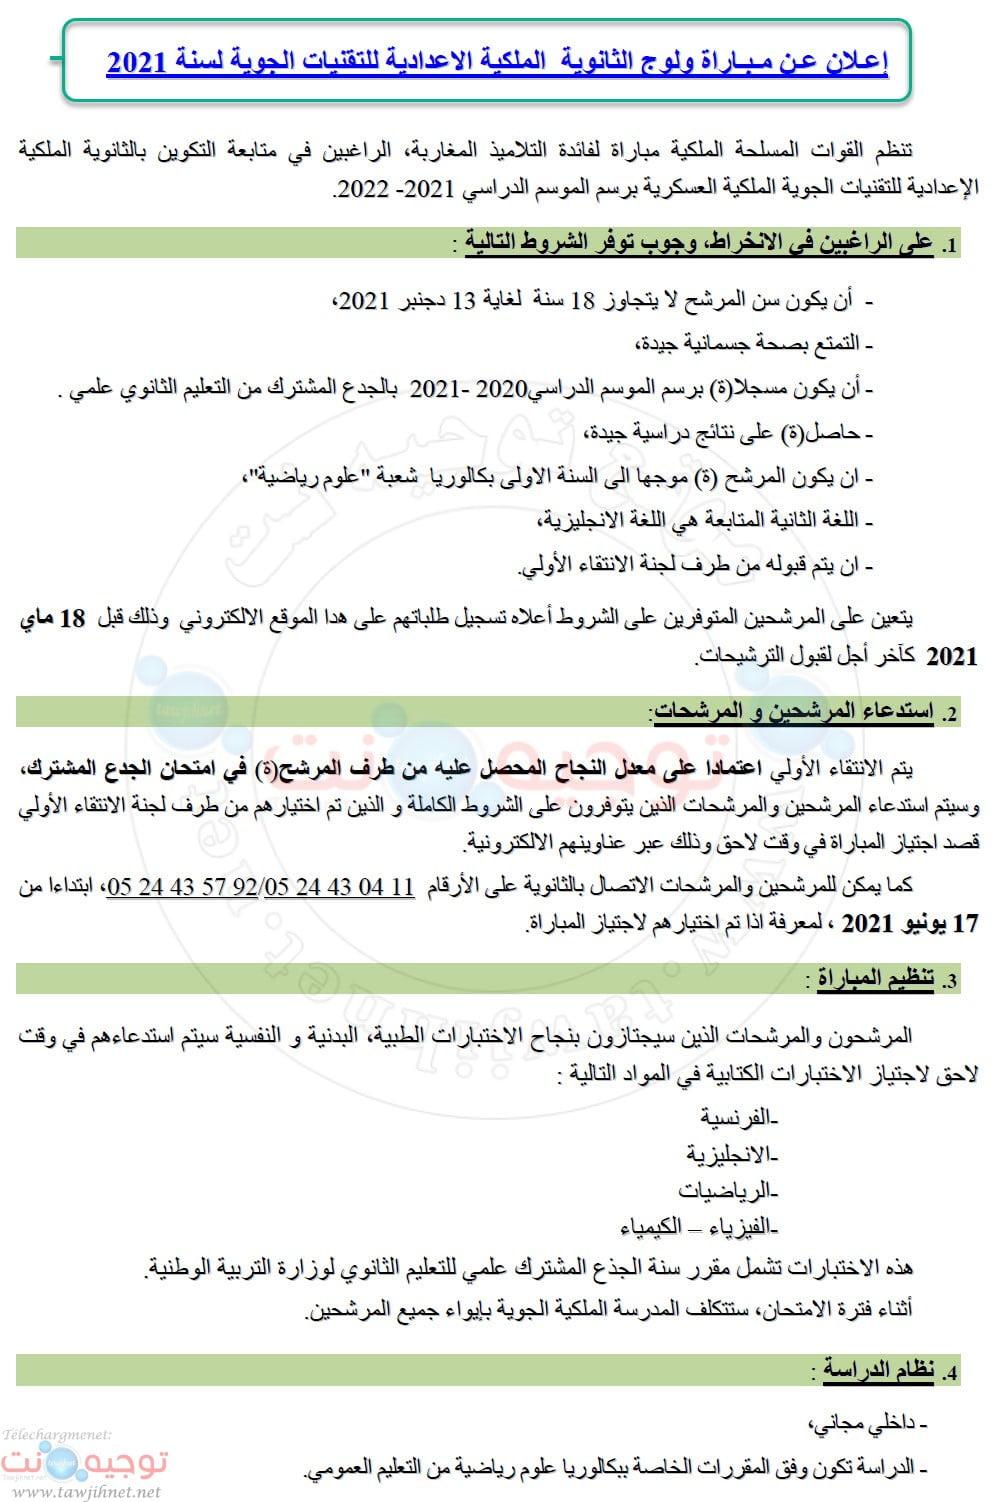 Concours Collège Royal Marrakech CRPTA   2021 -2022 الثانوية الاعدادية مراكش التقنيات الجوية